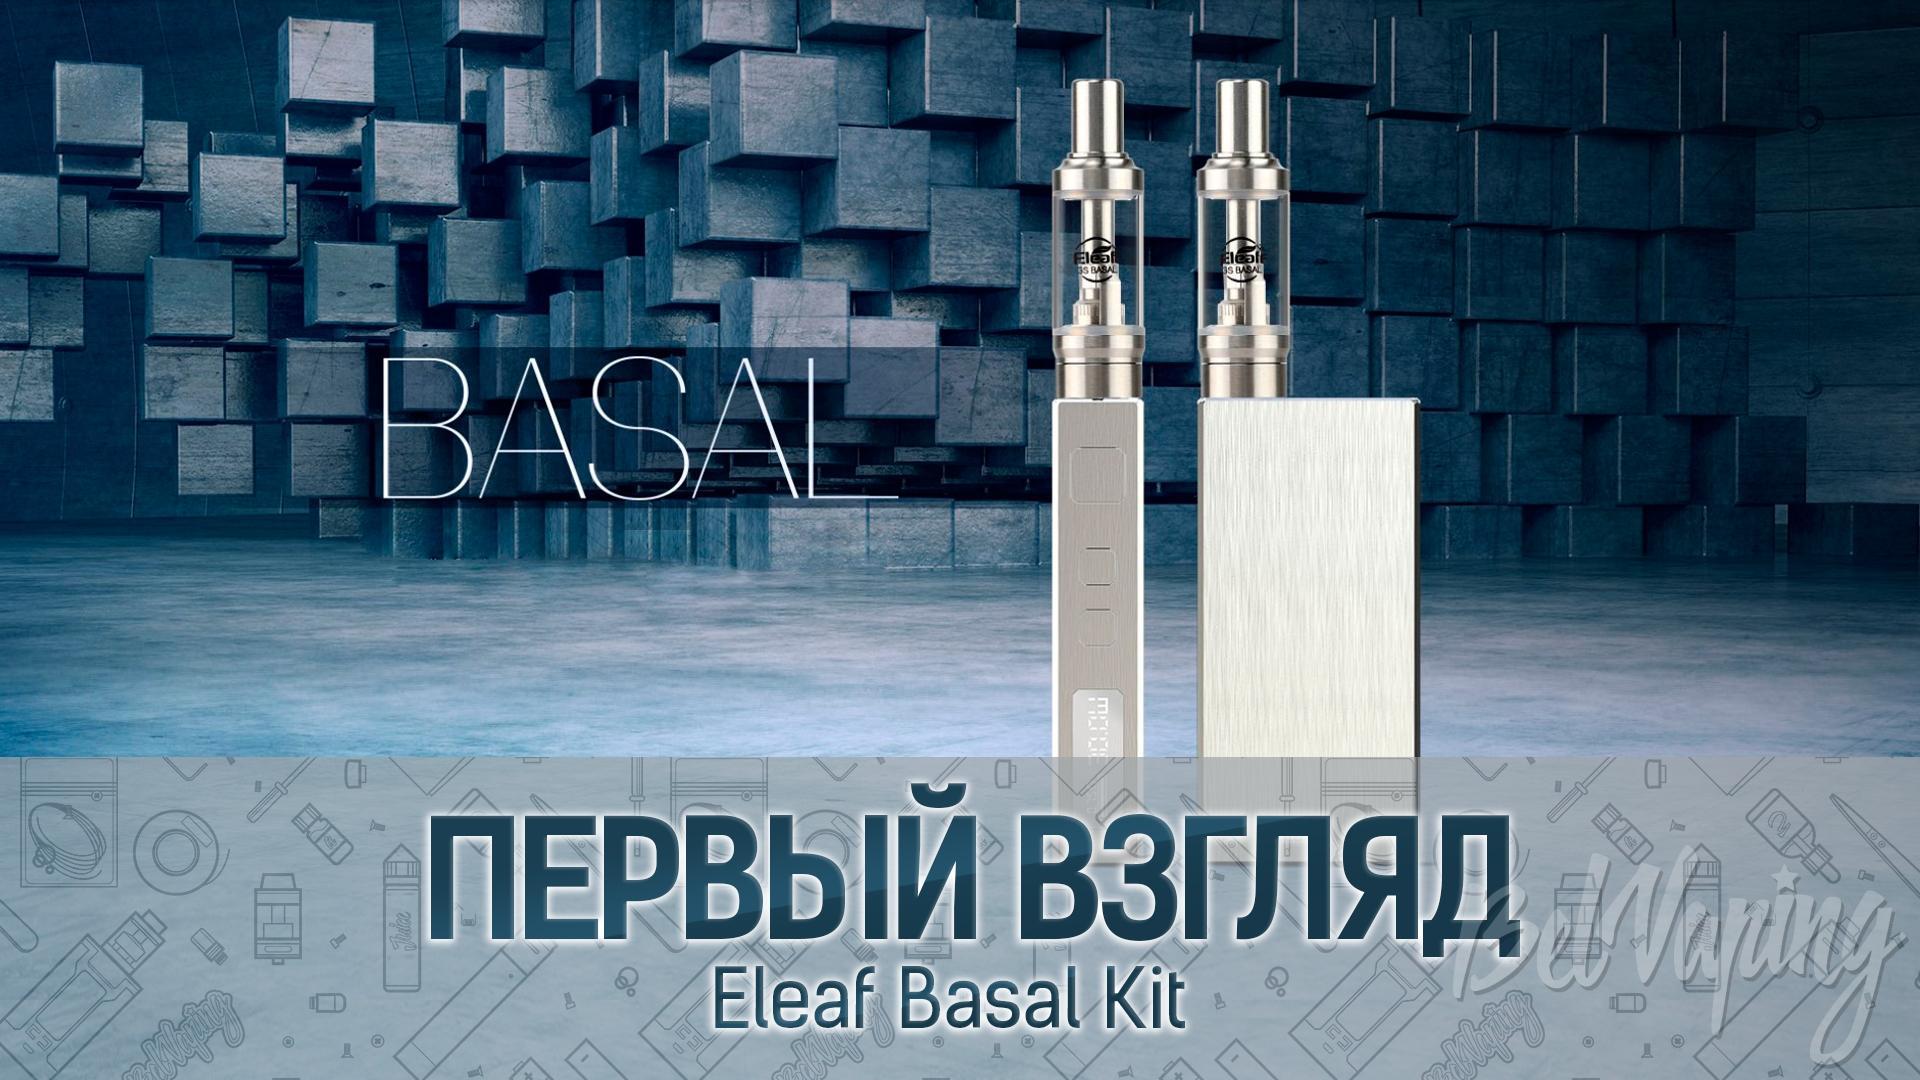 Eleaf Basal Kit. Первый взгляд